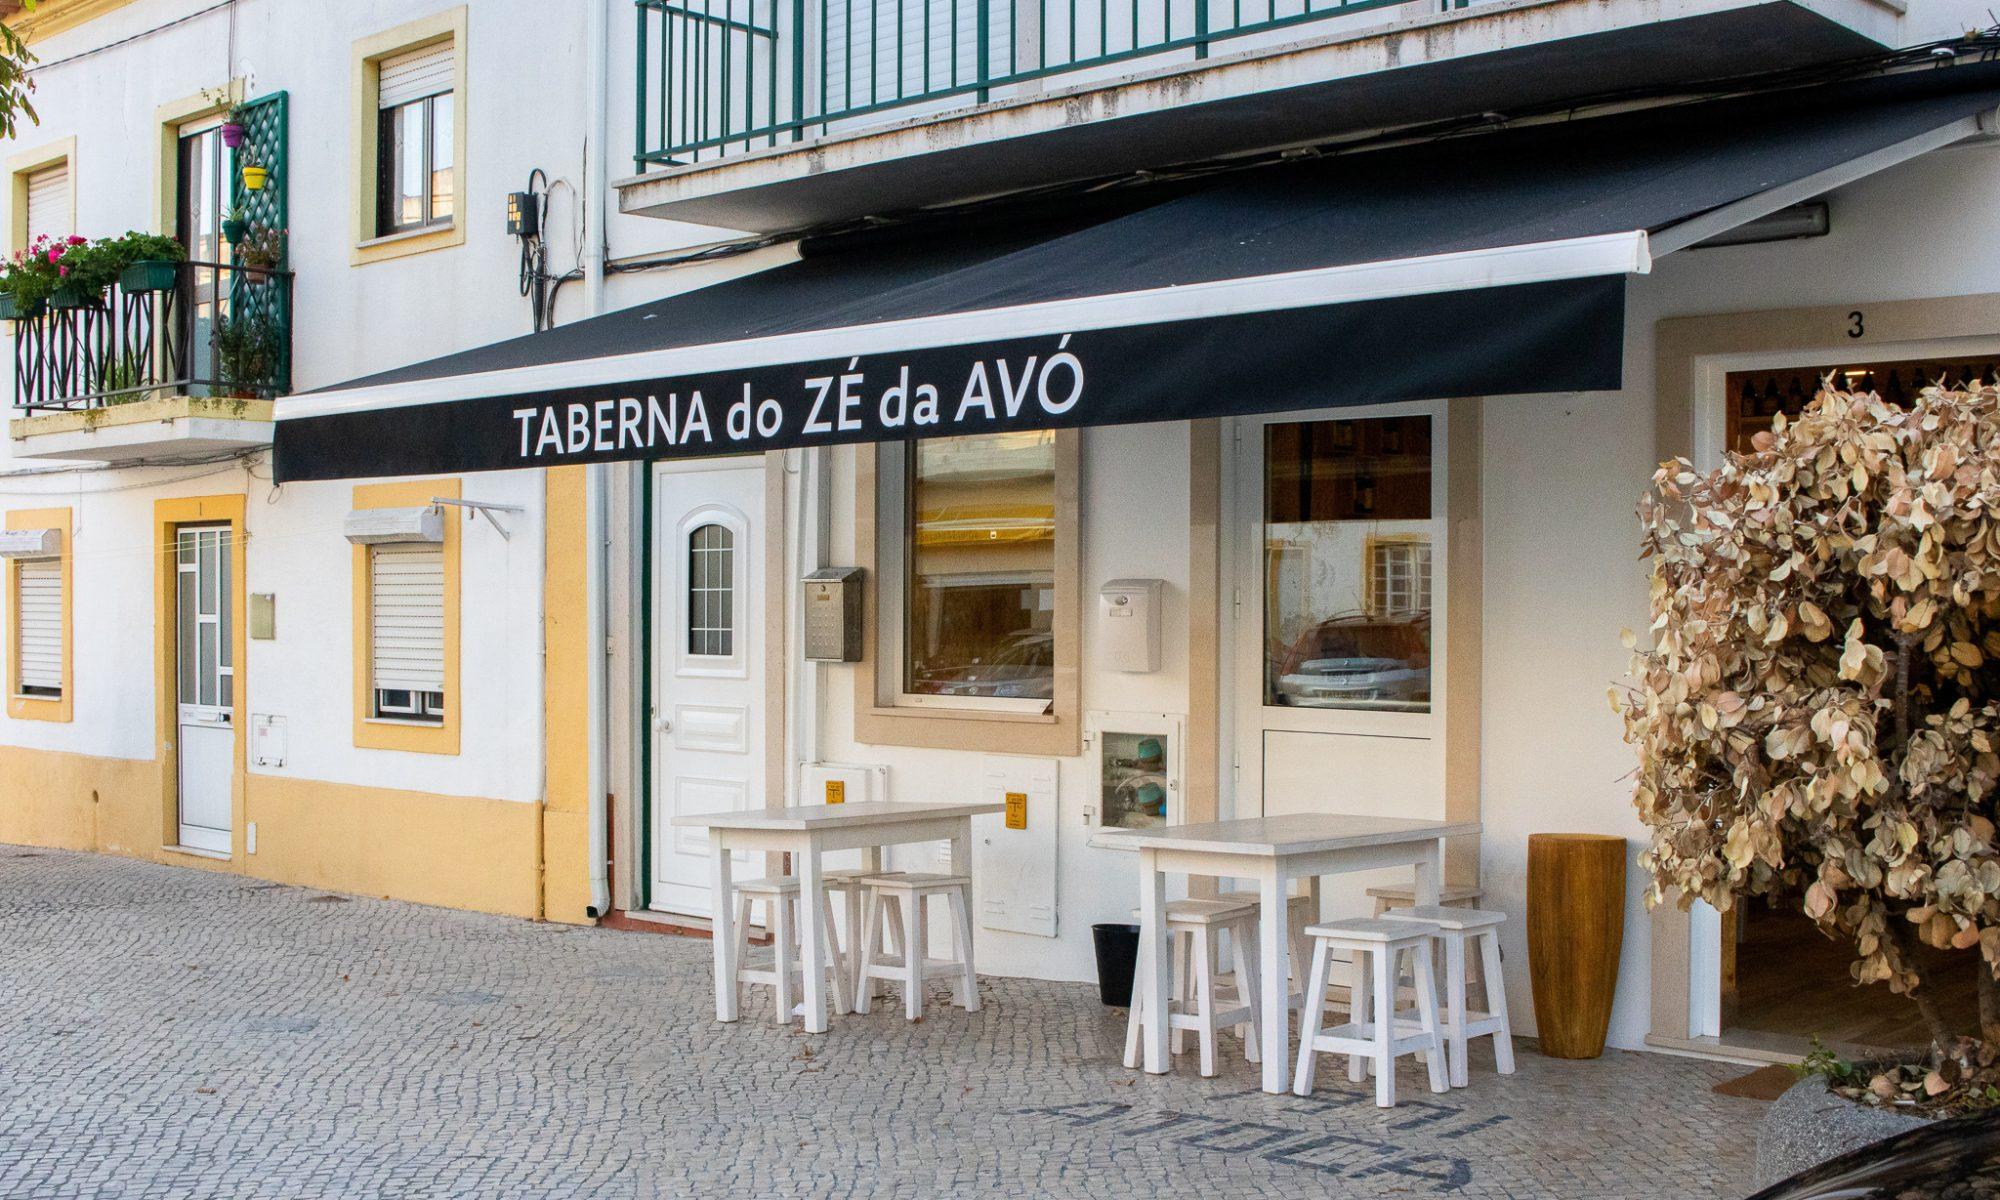 taberna-ze-da-avo-nazare-comida-portuguesa-til-magazine-leiria